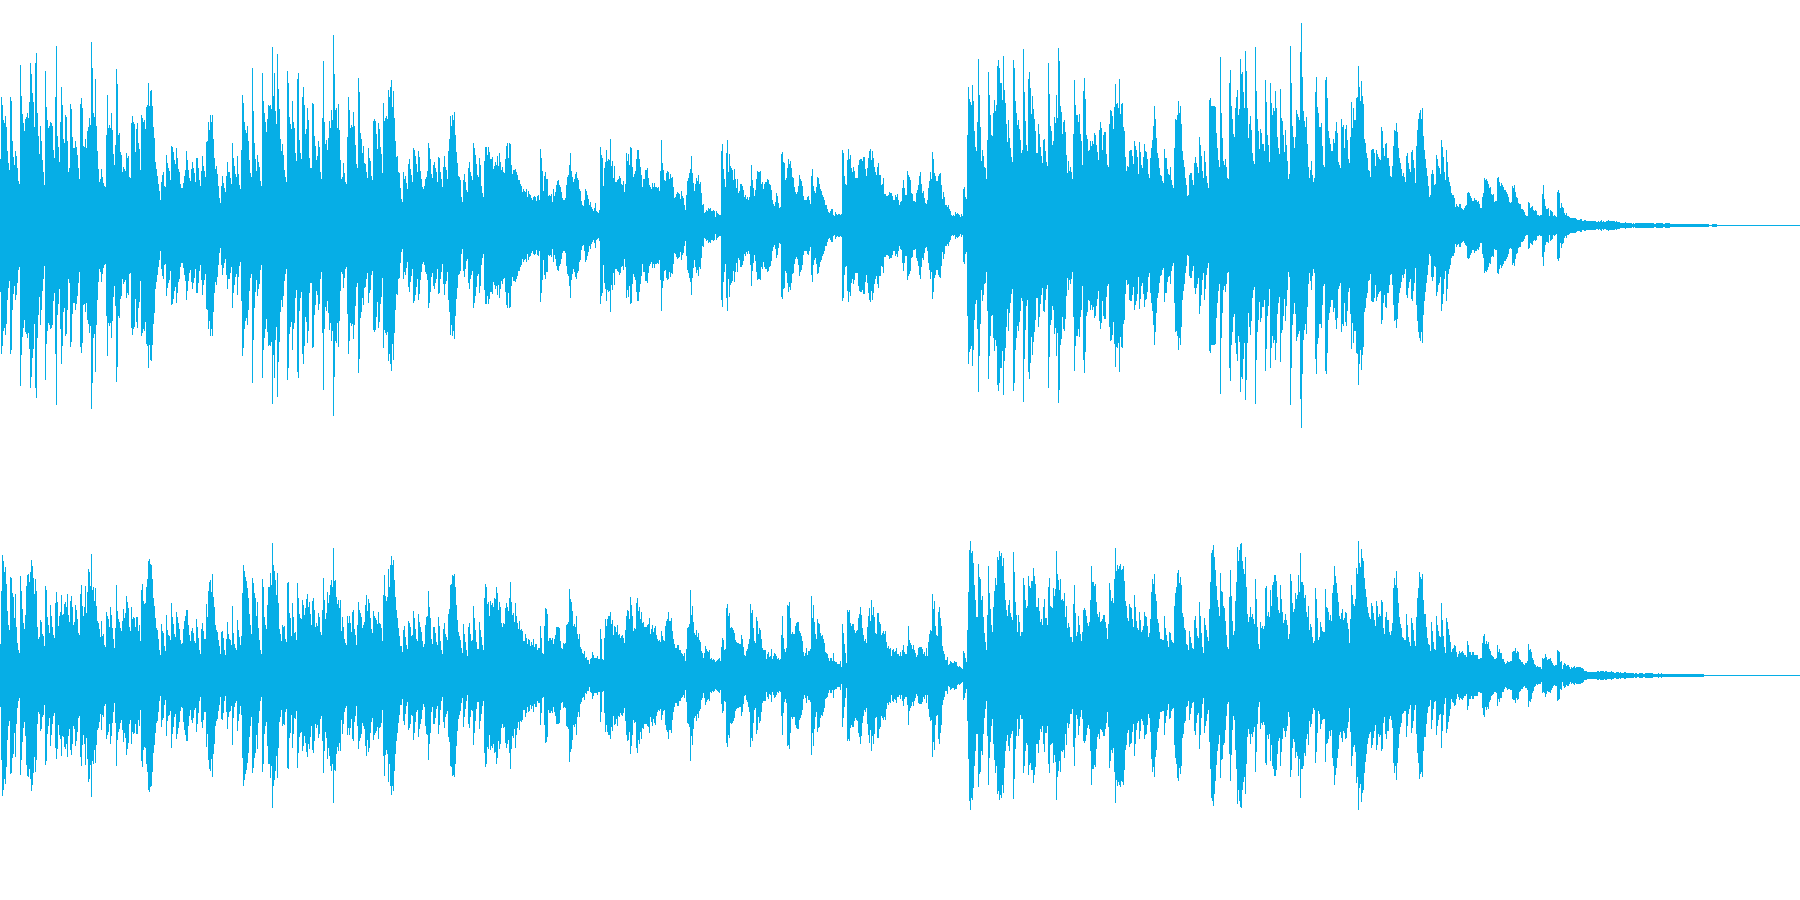 SNS広告 ピアノメイン スタイリッシュの再生済みの波形